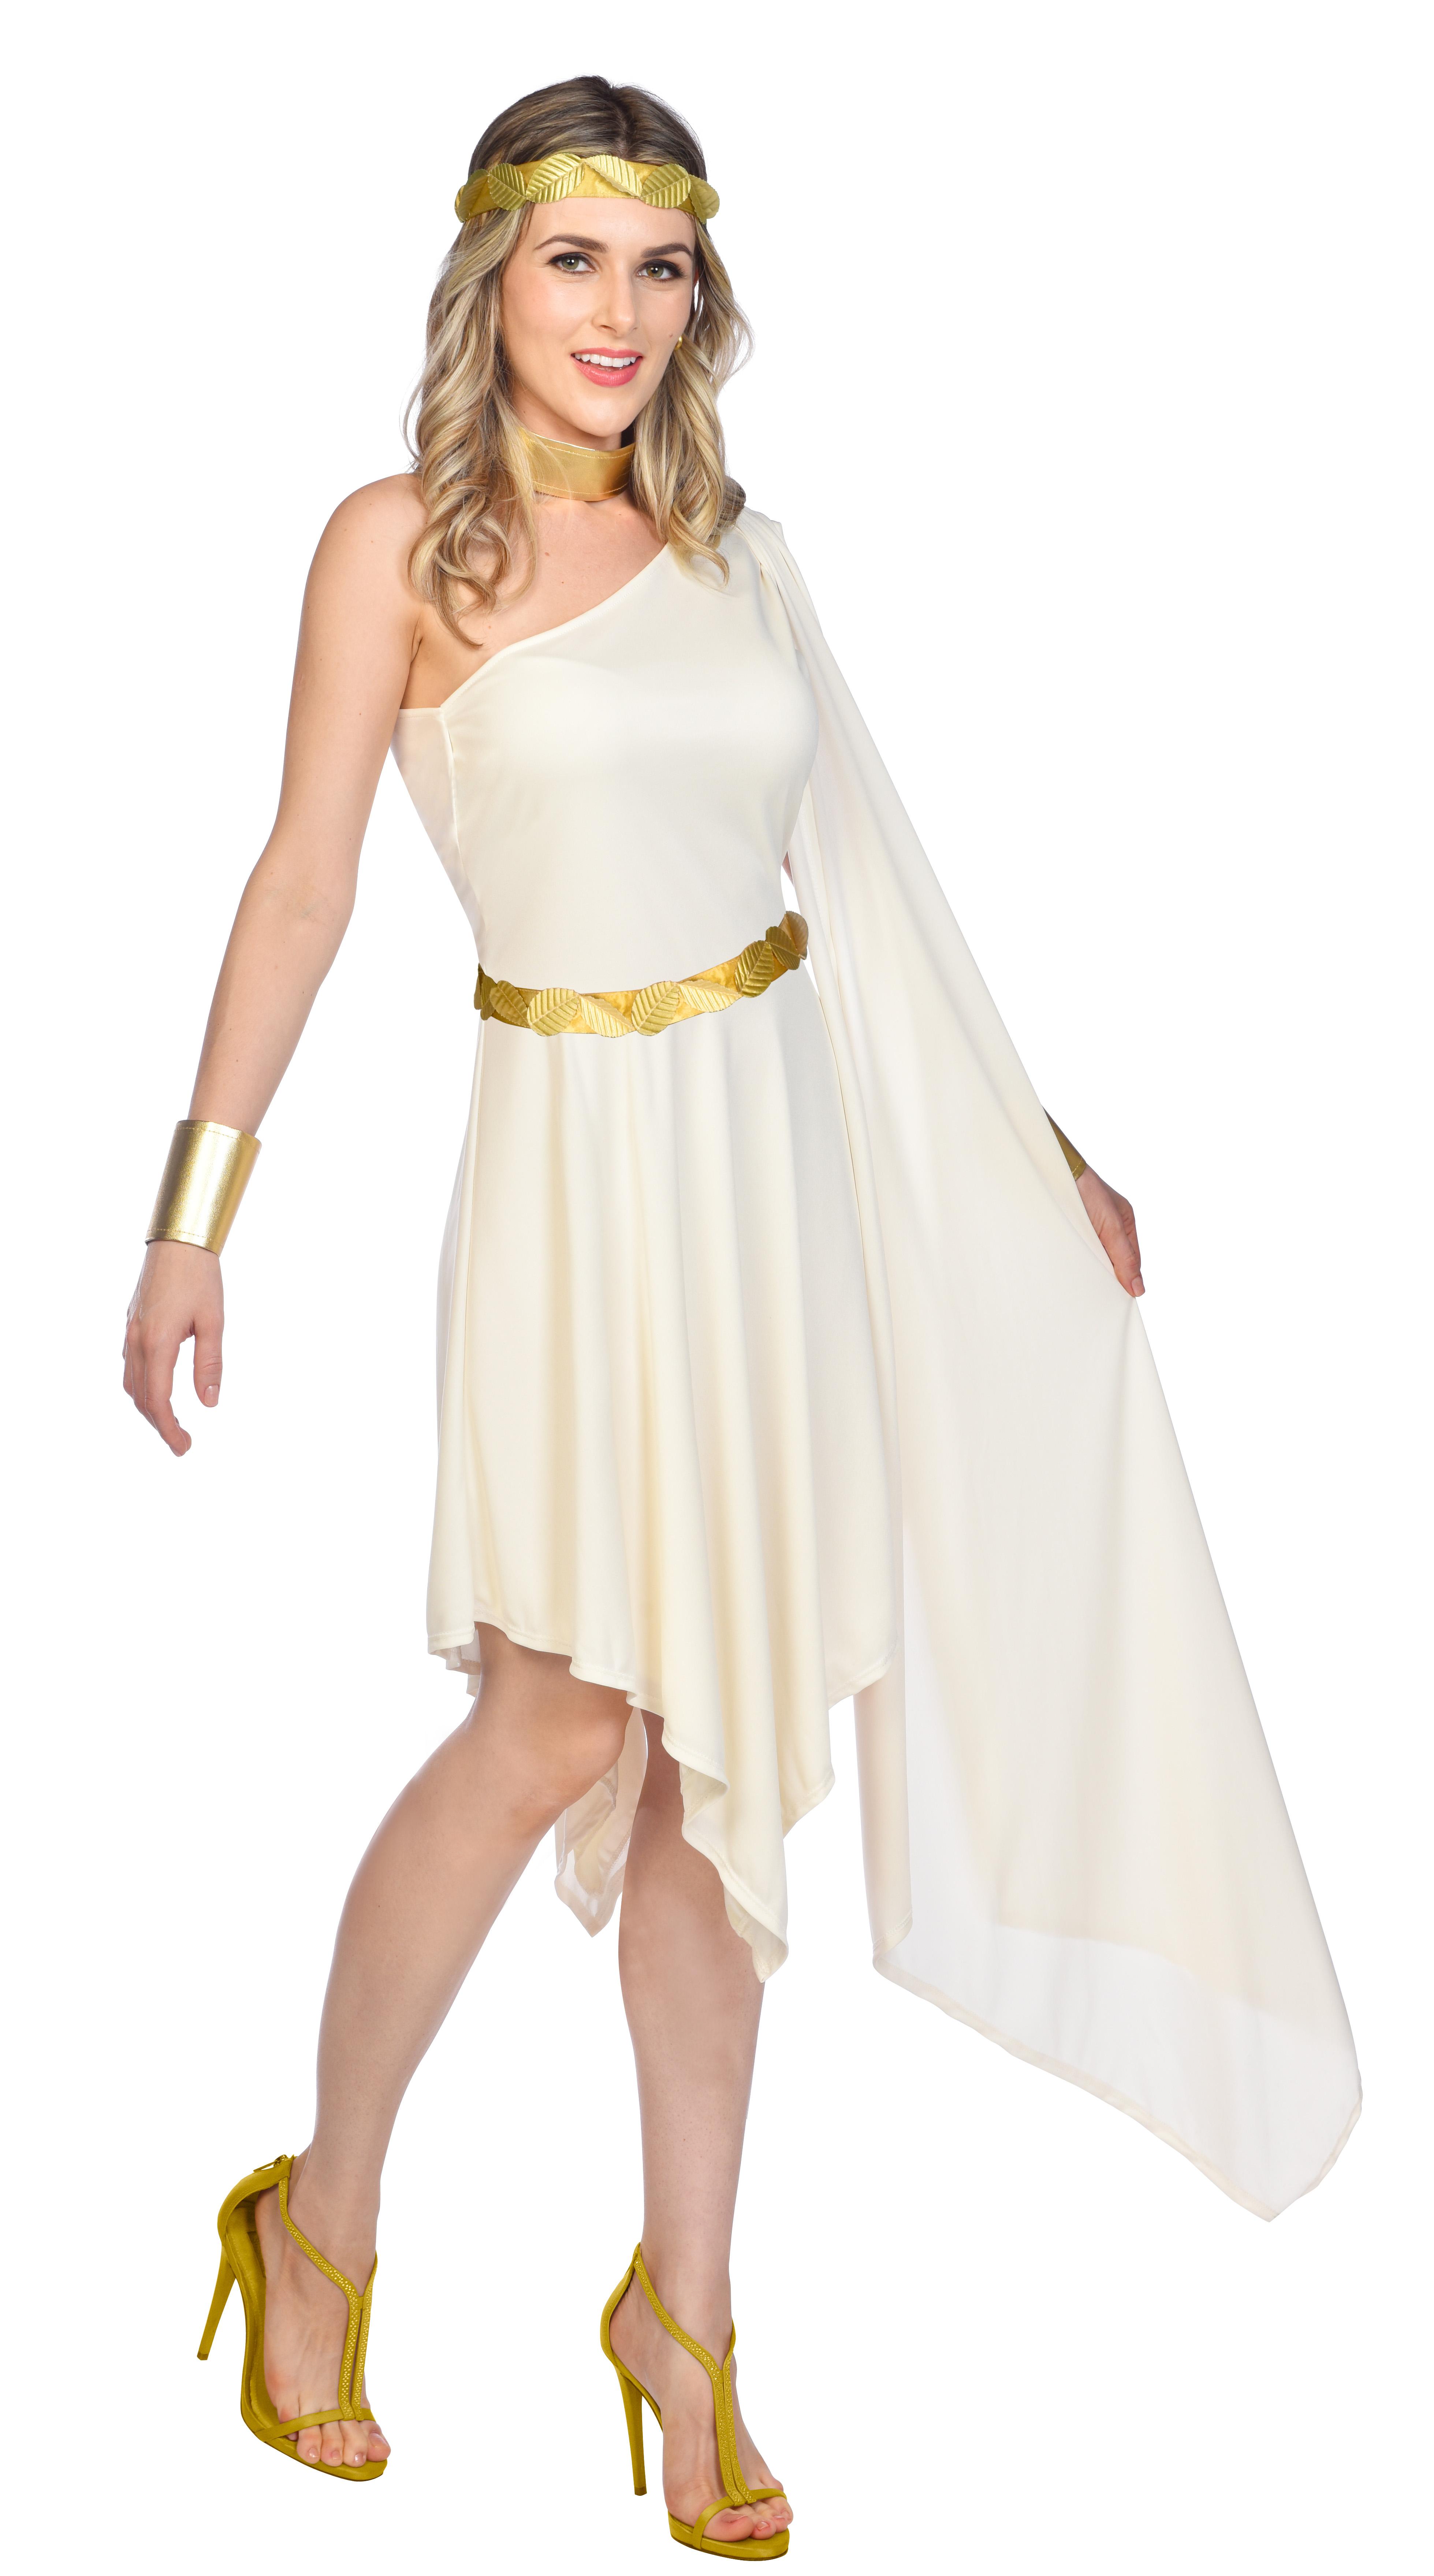 Indexbild 19 - Adult Ladies Golden Goddess Gladiator Greek Roman Toga Fancy Dress Costume New